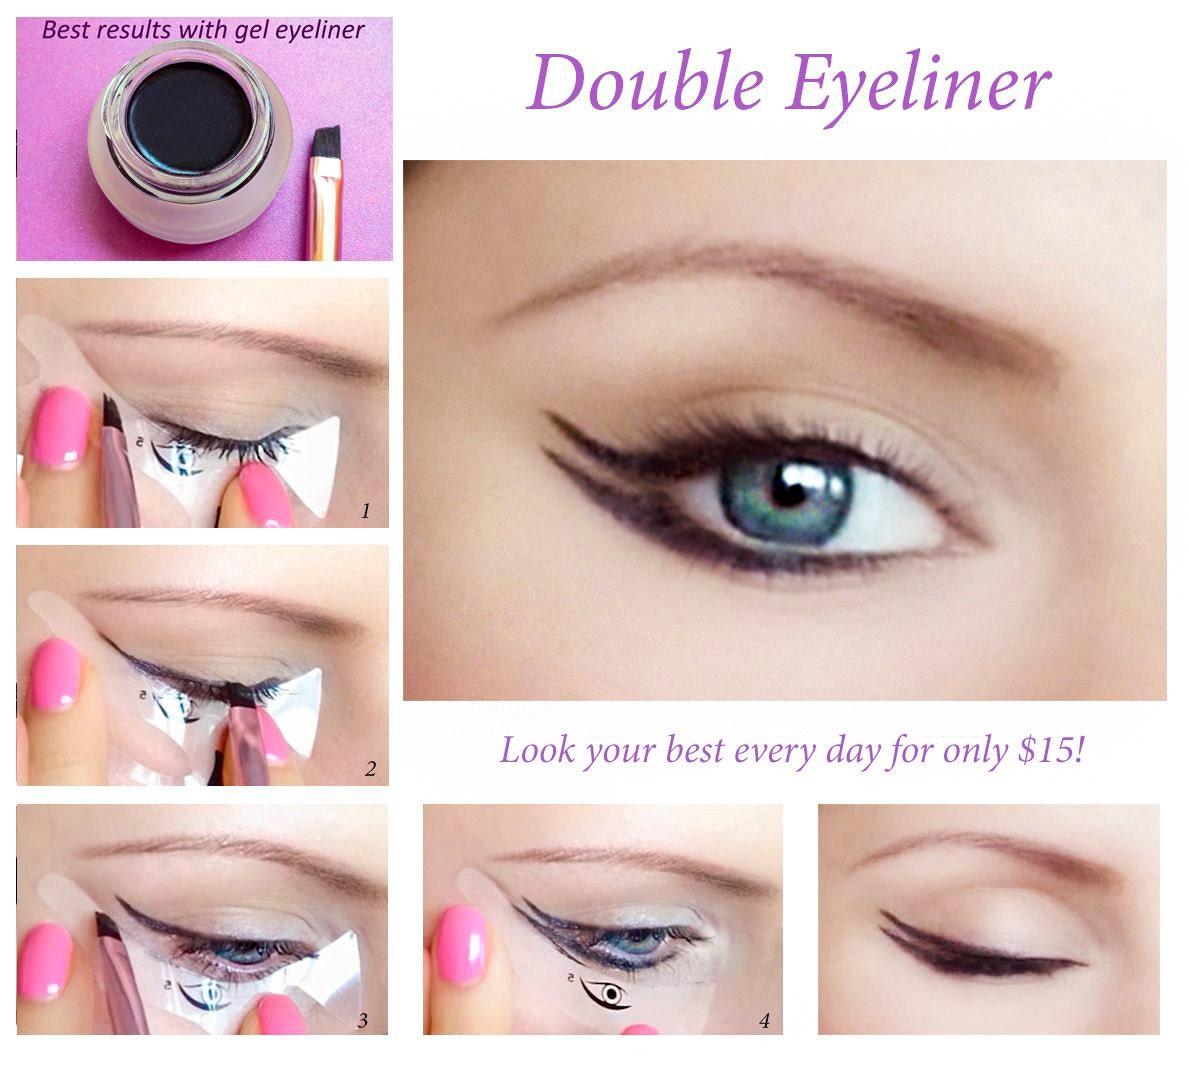 Makeup Ideas » Makeup Stencils - Beautiful Makeup Ideas and Tutorials